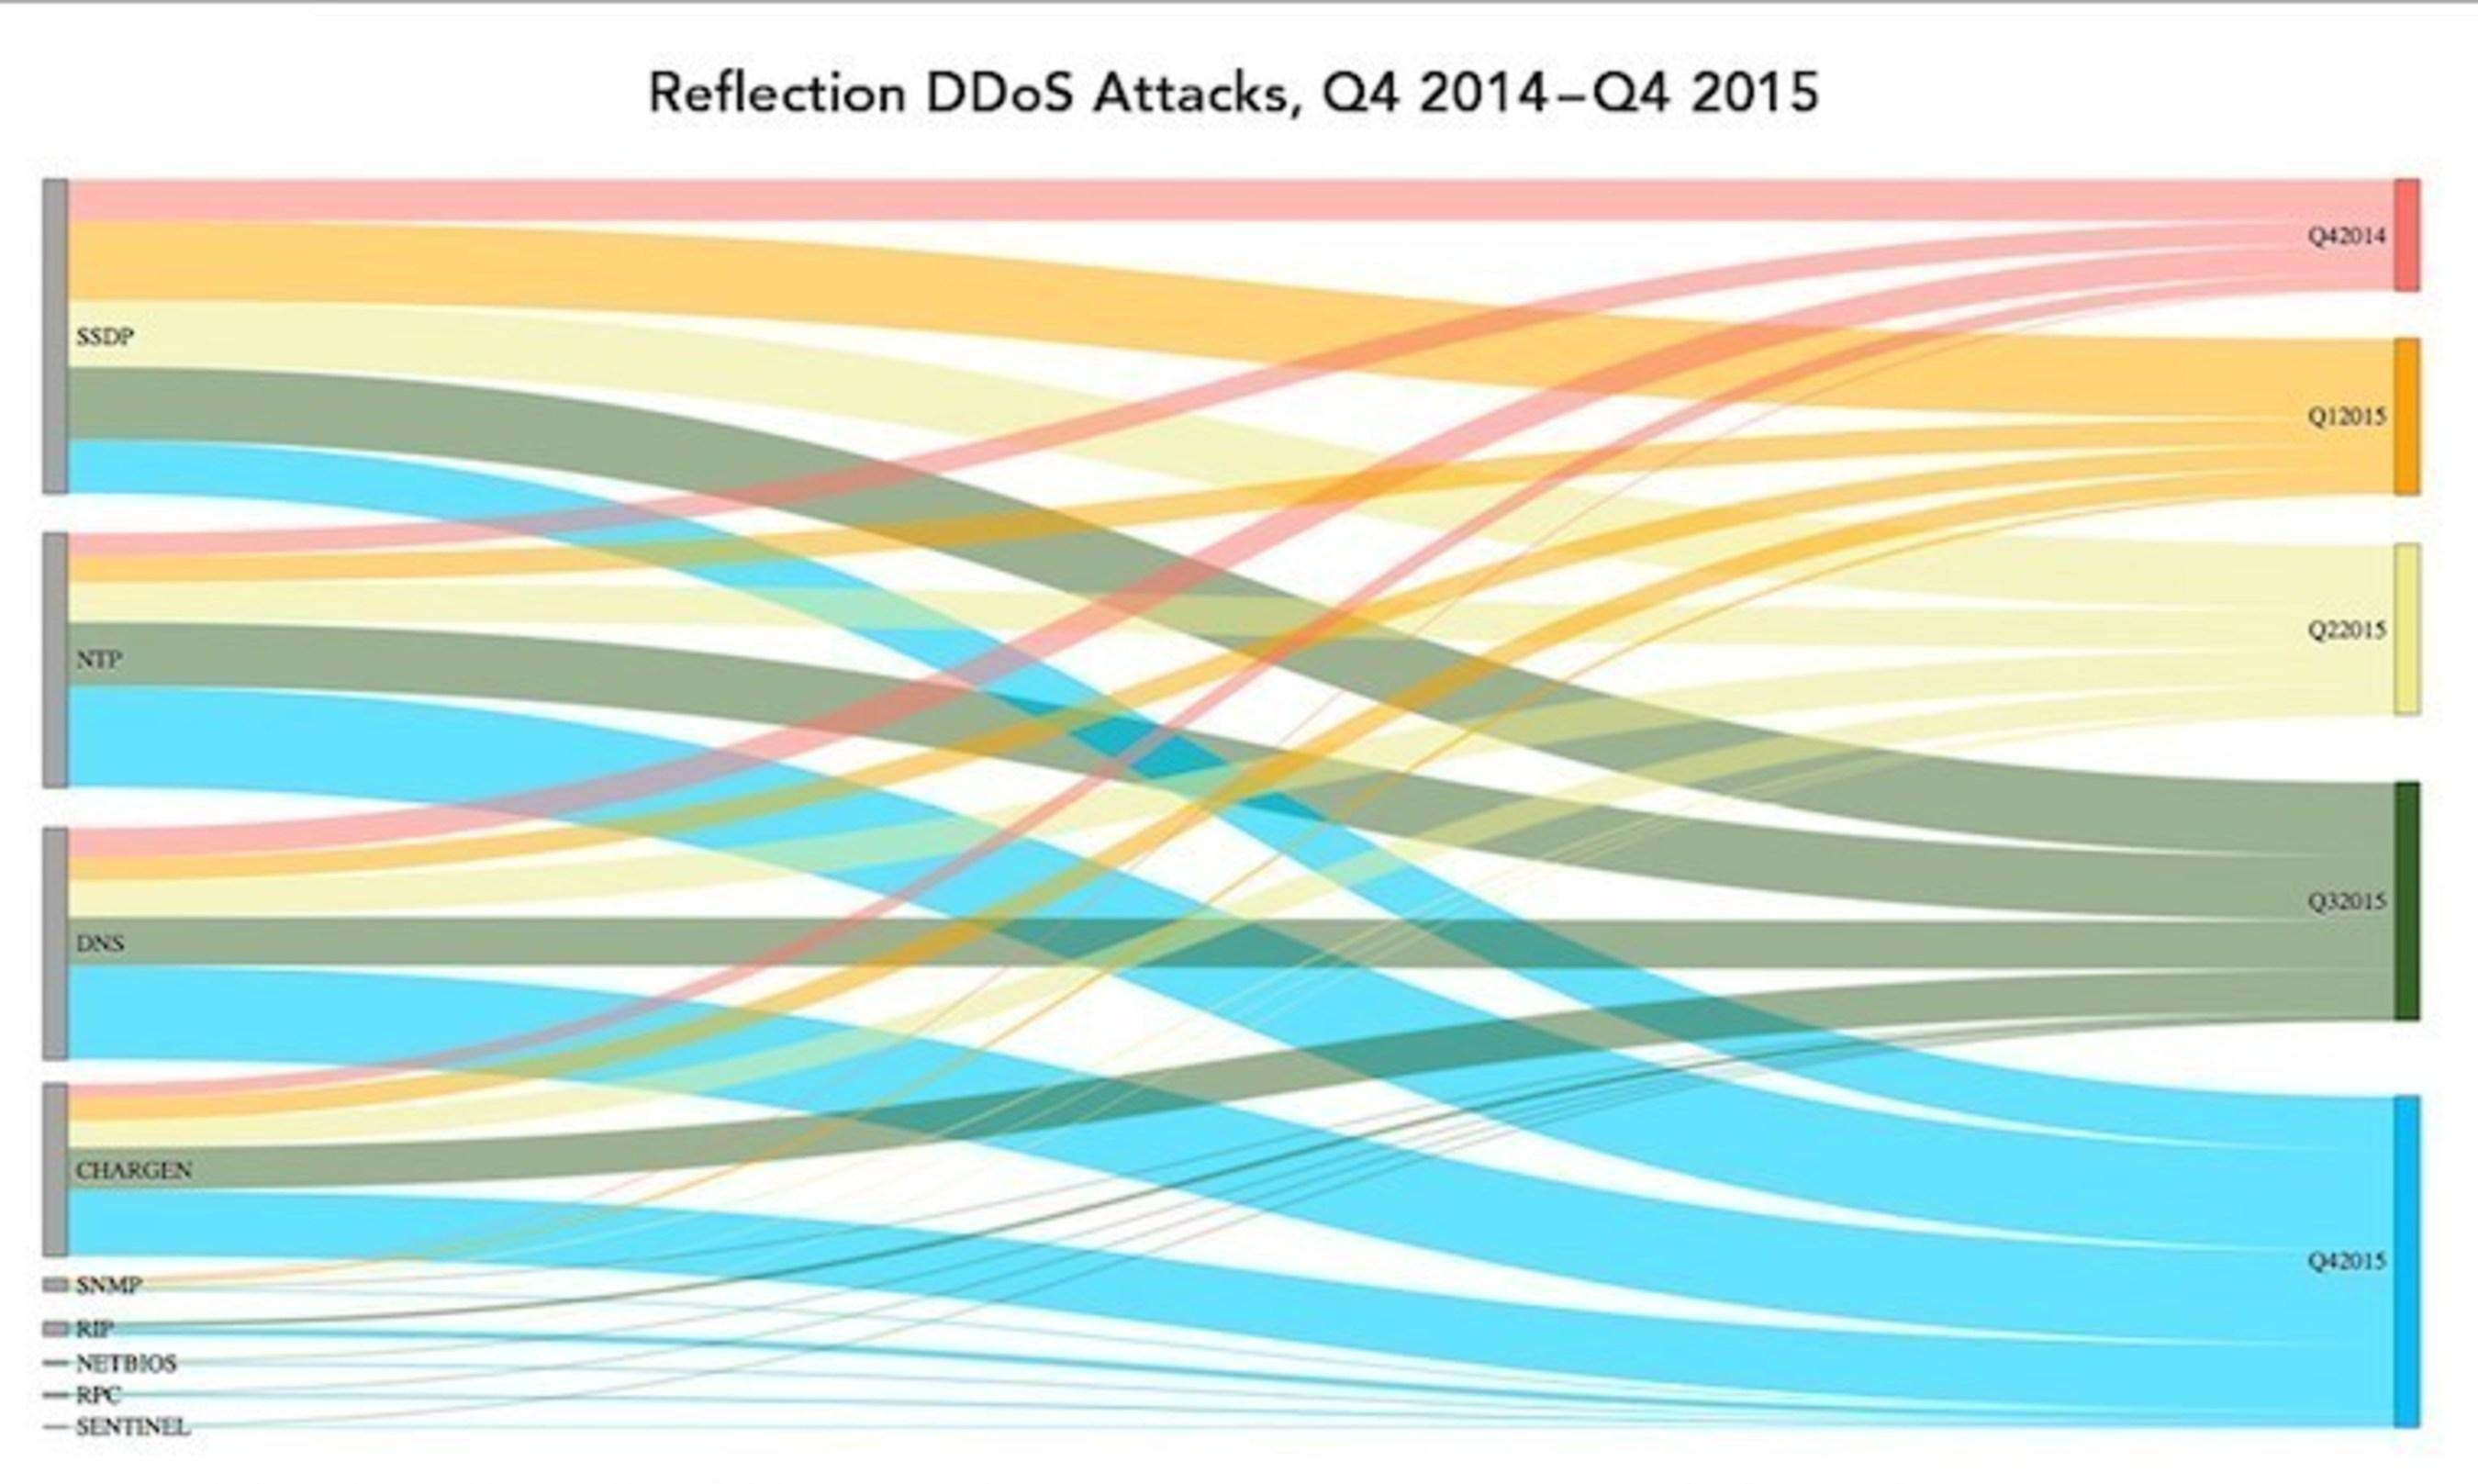 DDoS, Web Attacks Surge